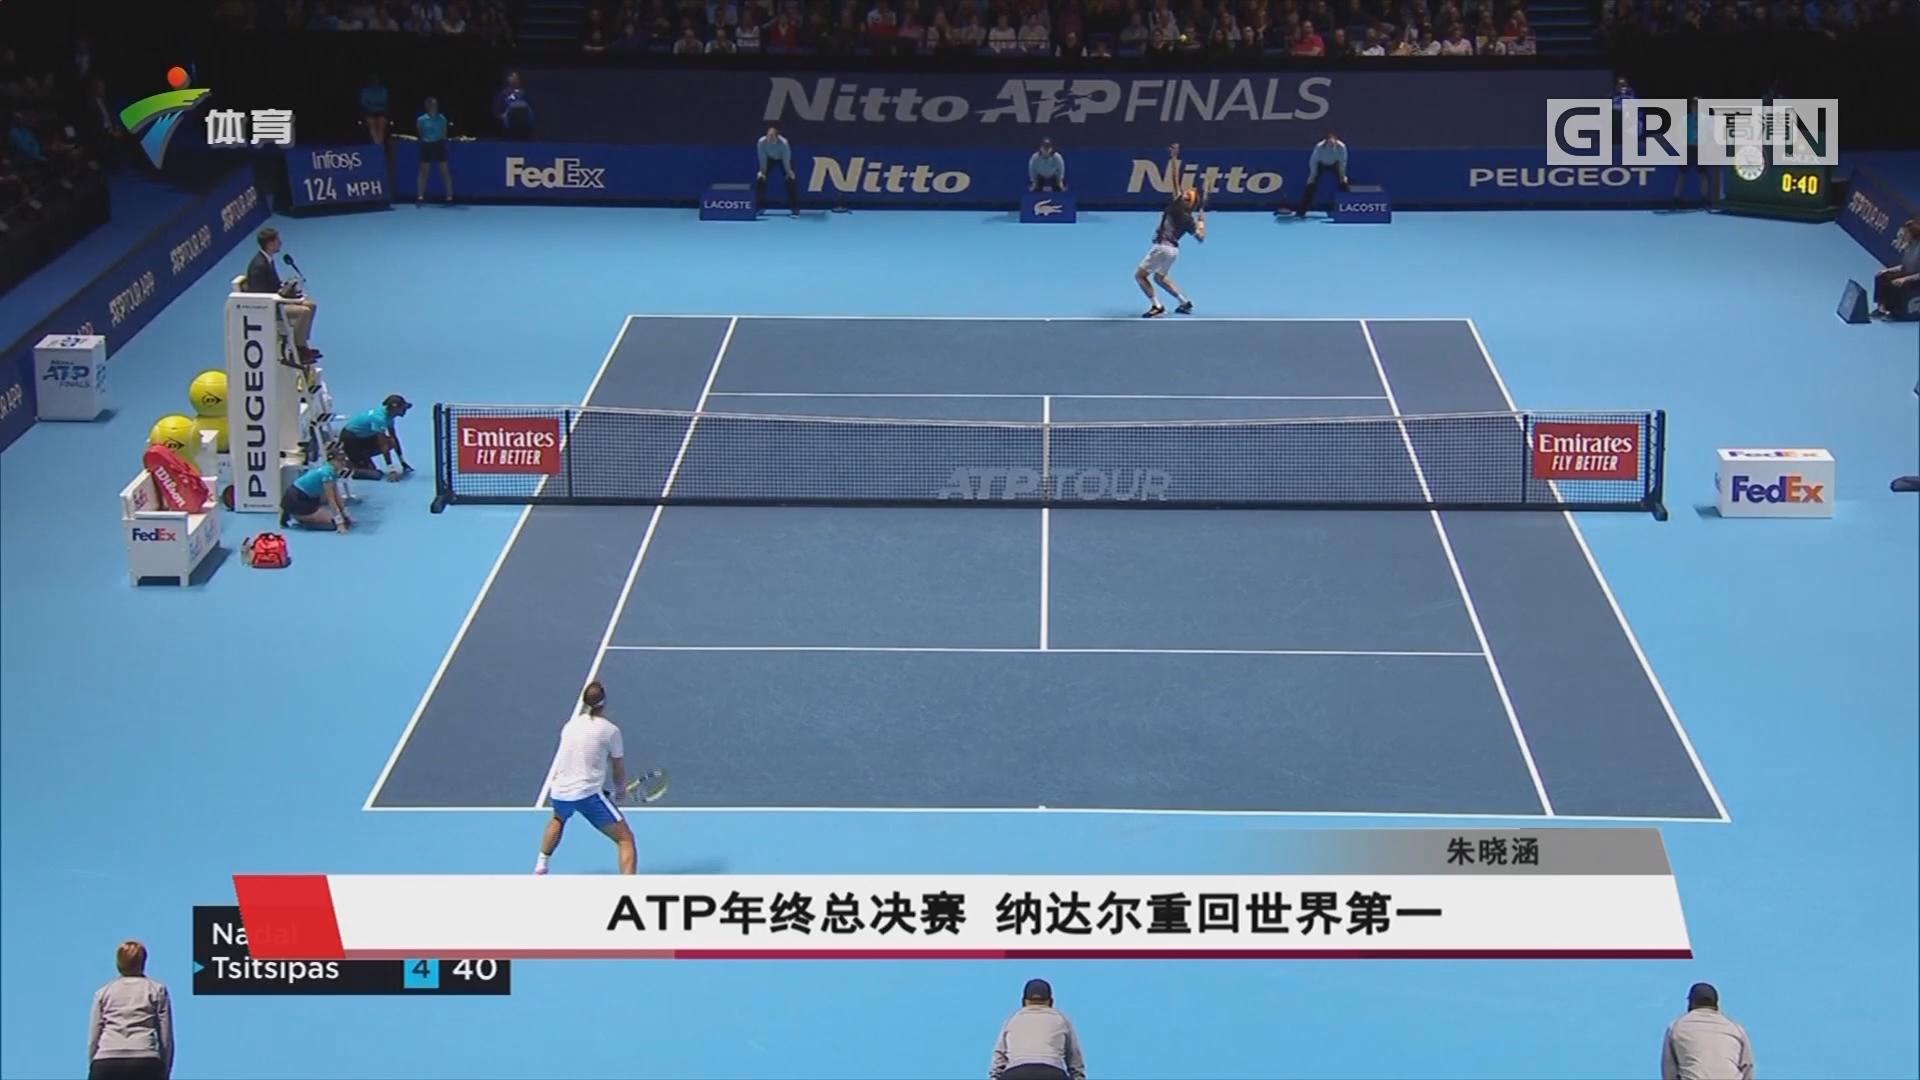 ATP年终总决赛 纳达尔重回世界第一